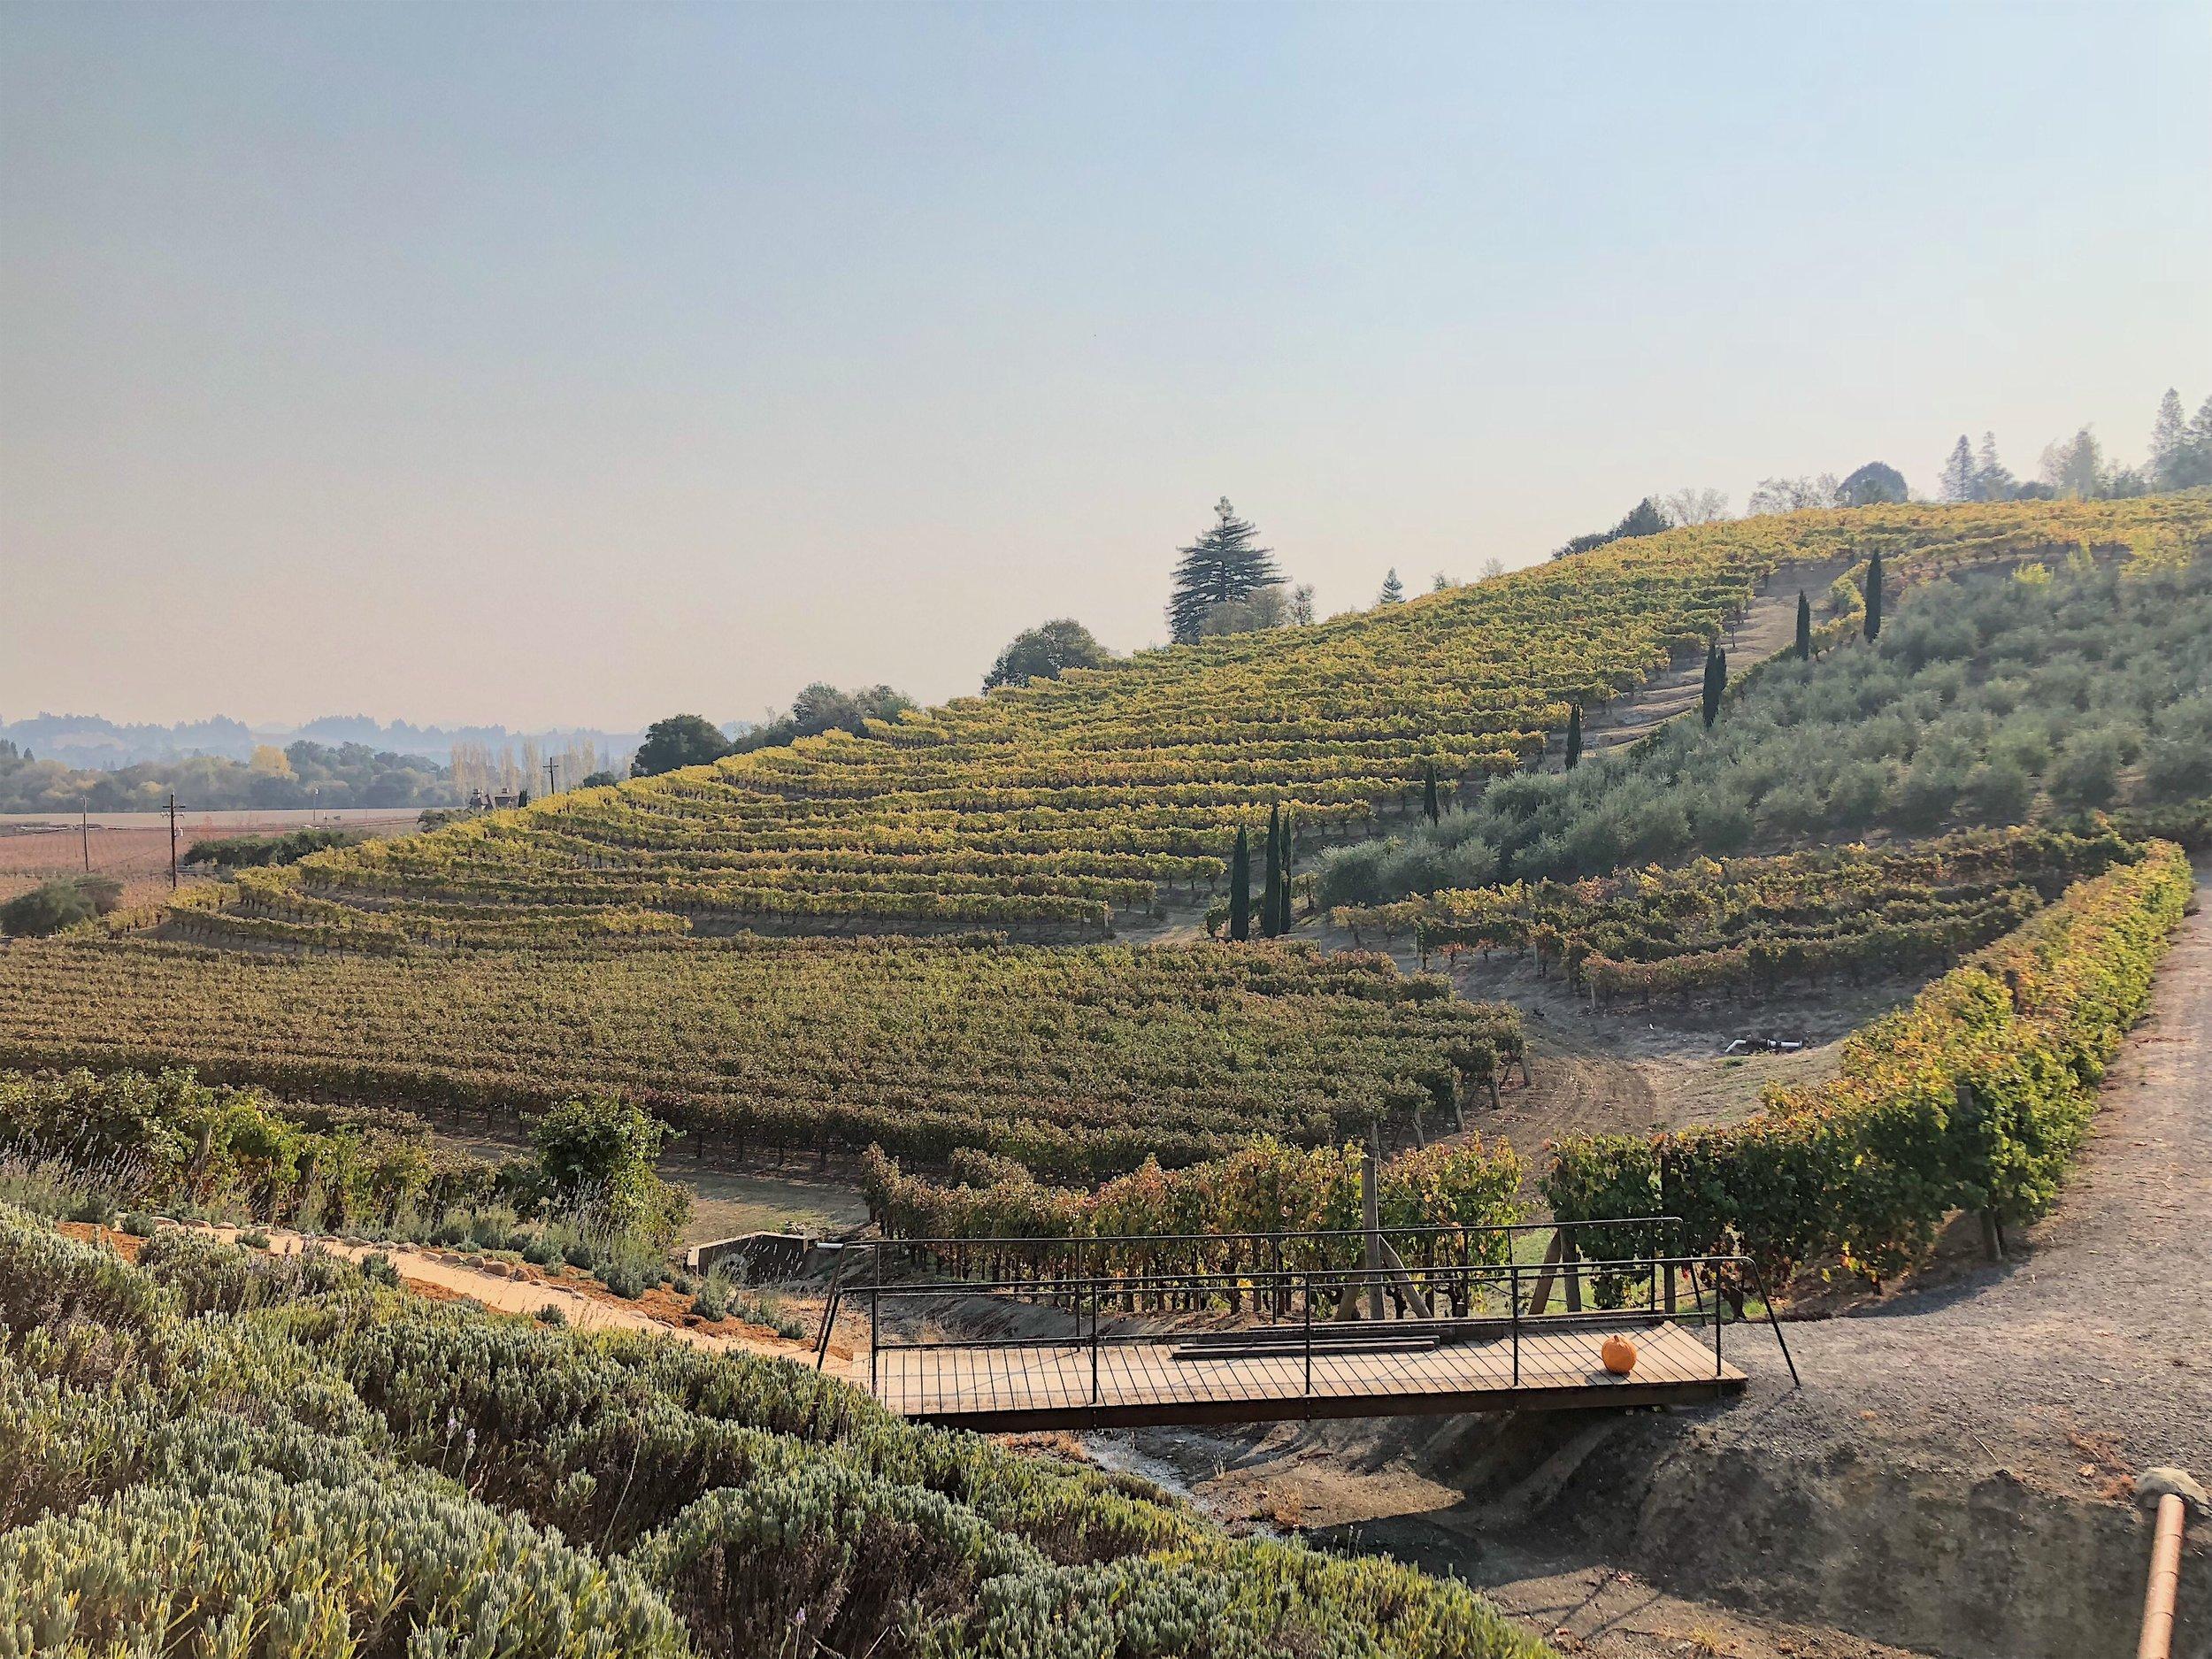 vineyards at A. Rafanelli